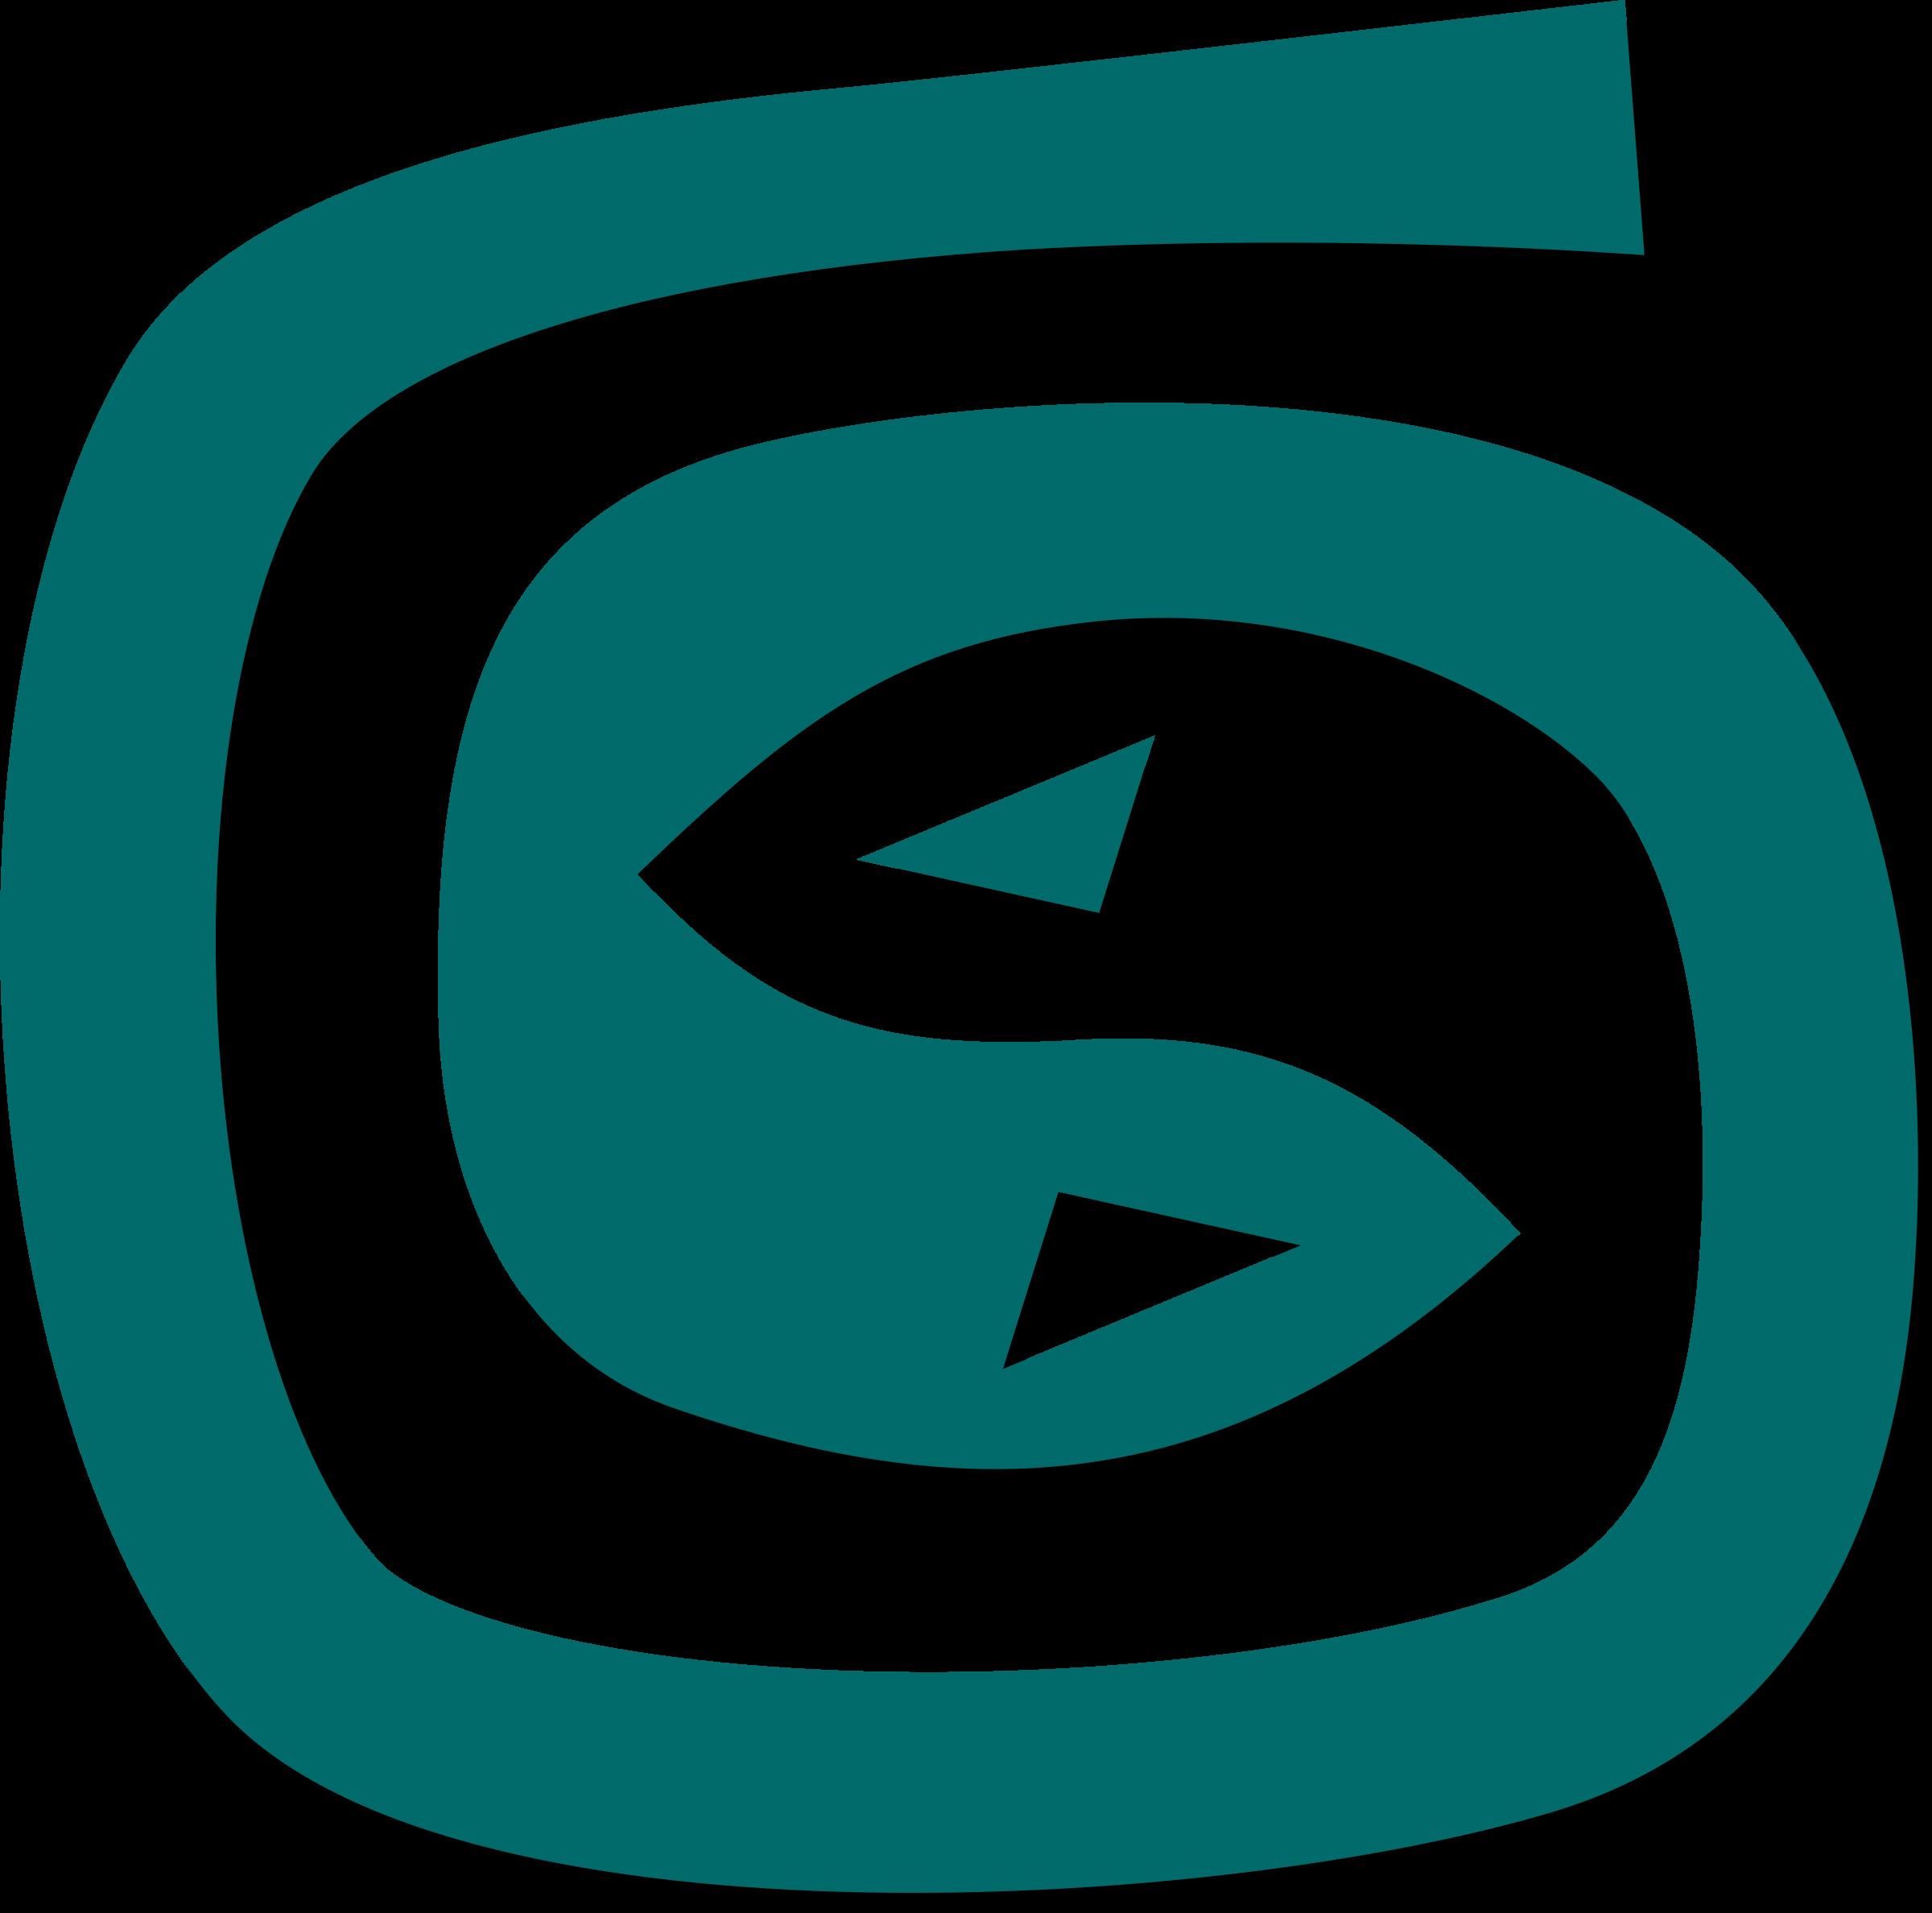 3ds Max Logo PNG Transparent & SVG Vector.